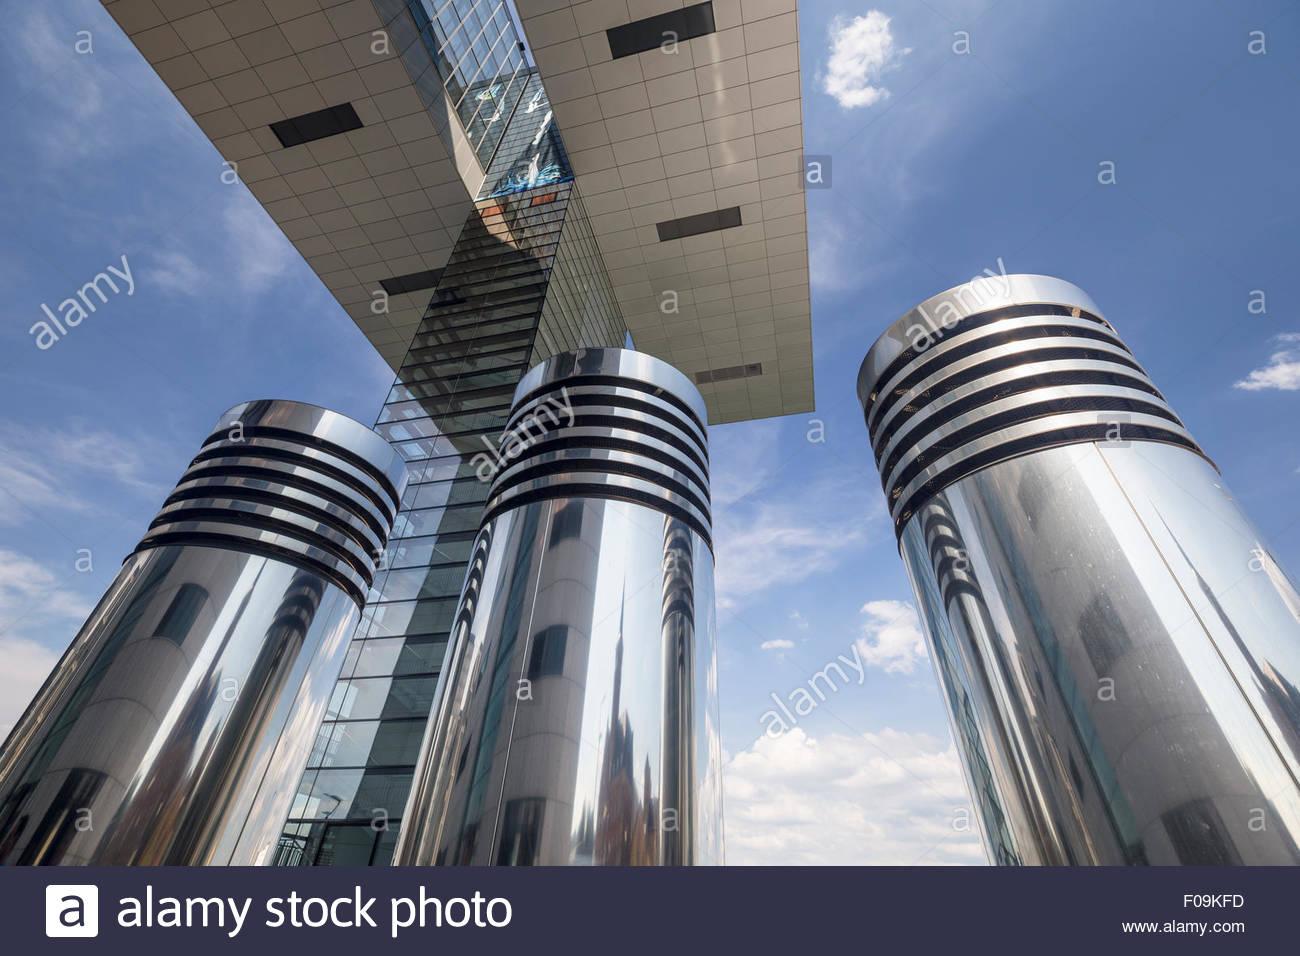 Kranhaeuser Kranhaus Buildings Upside Down L Shape Spectacular Urban  Regeneration Project Modern Landmark Cologne Germany Europe